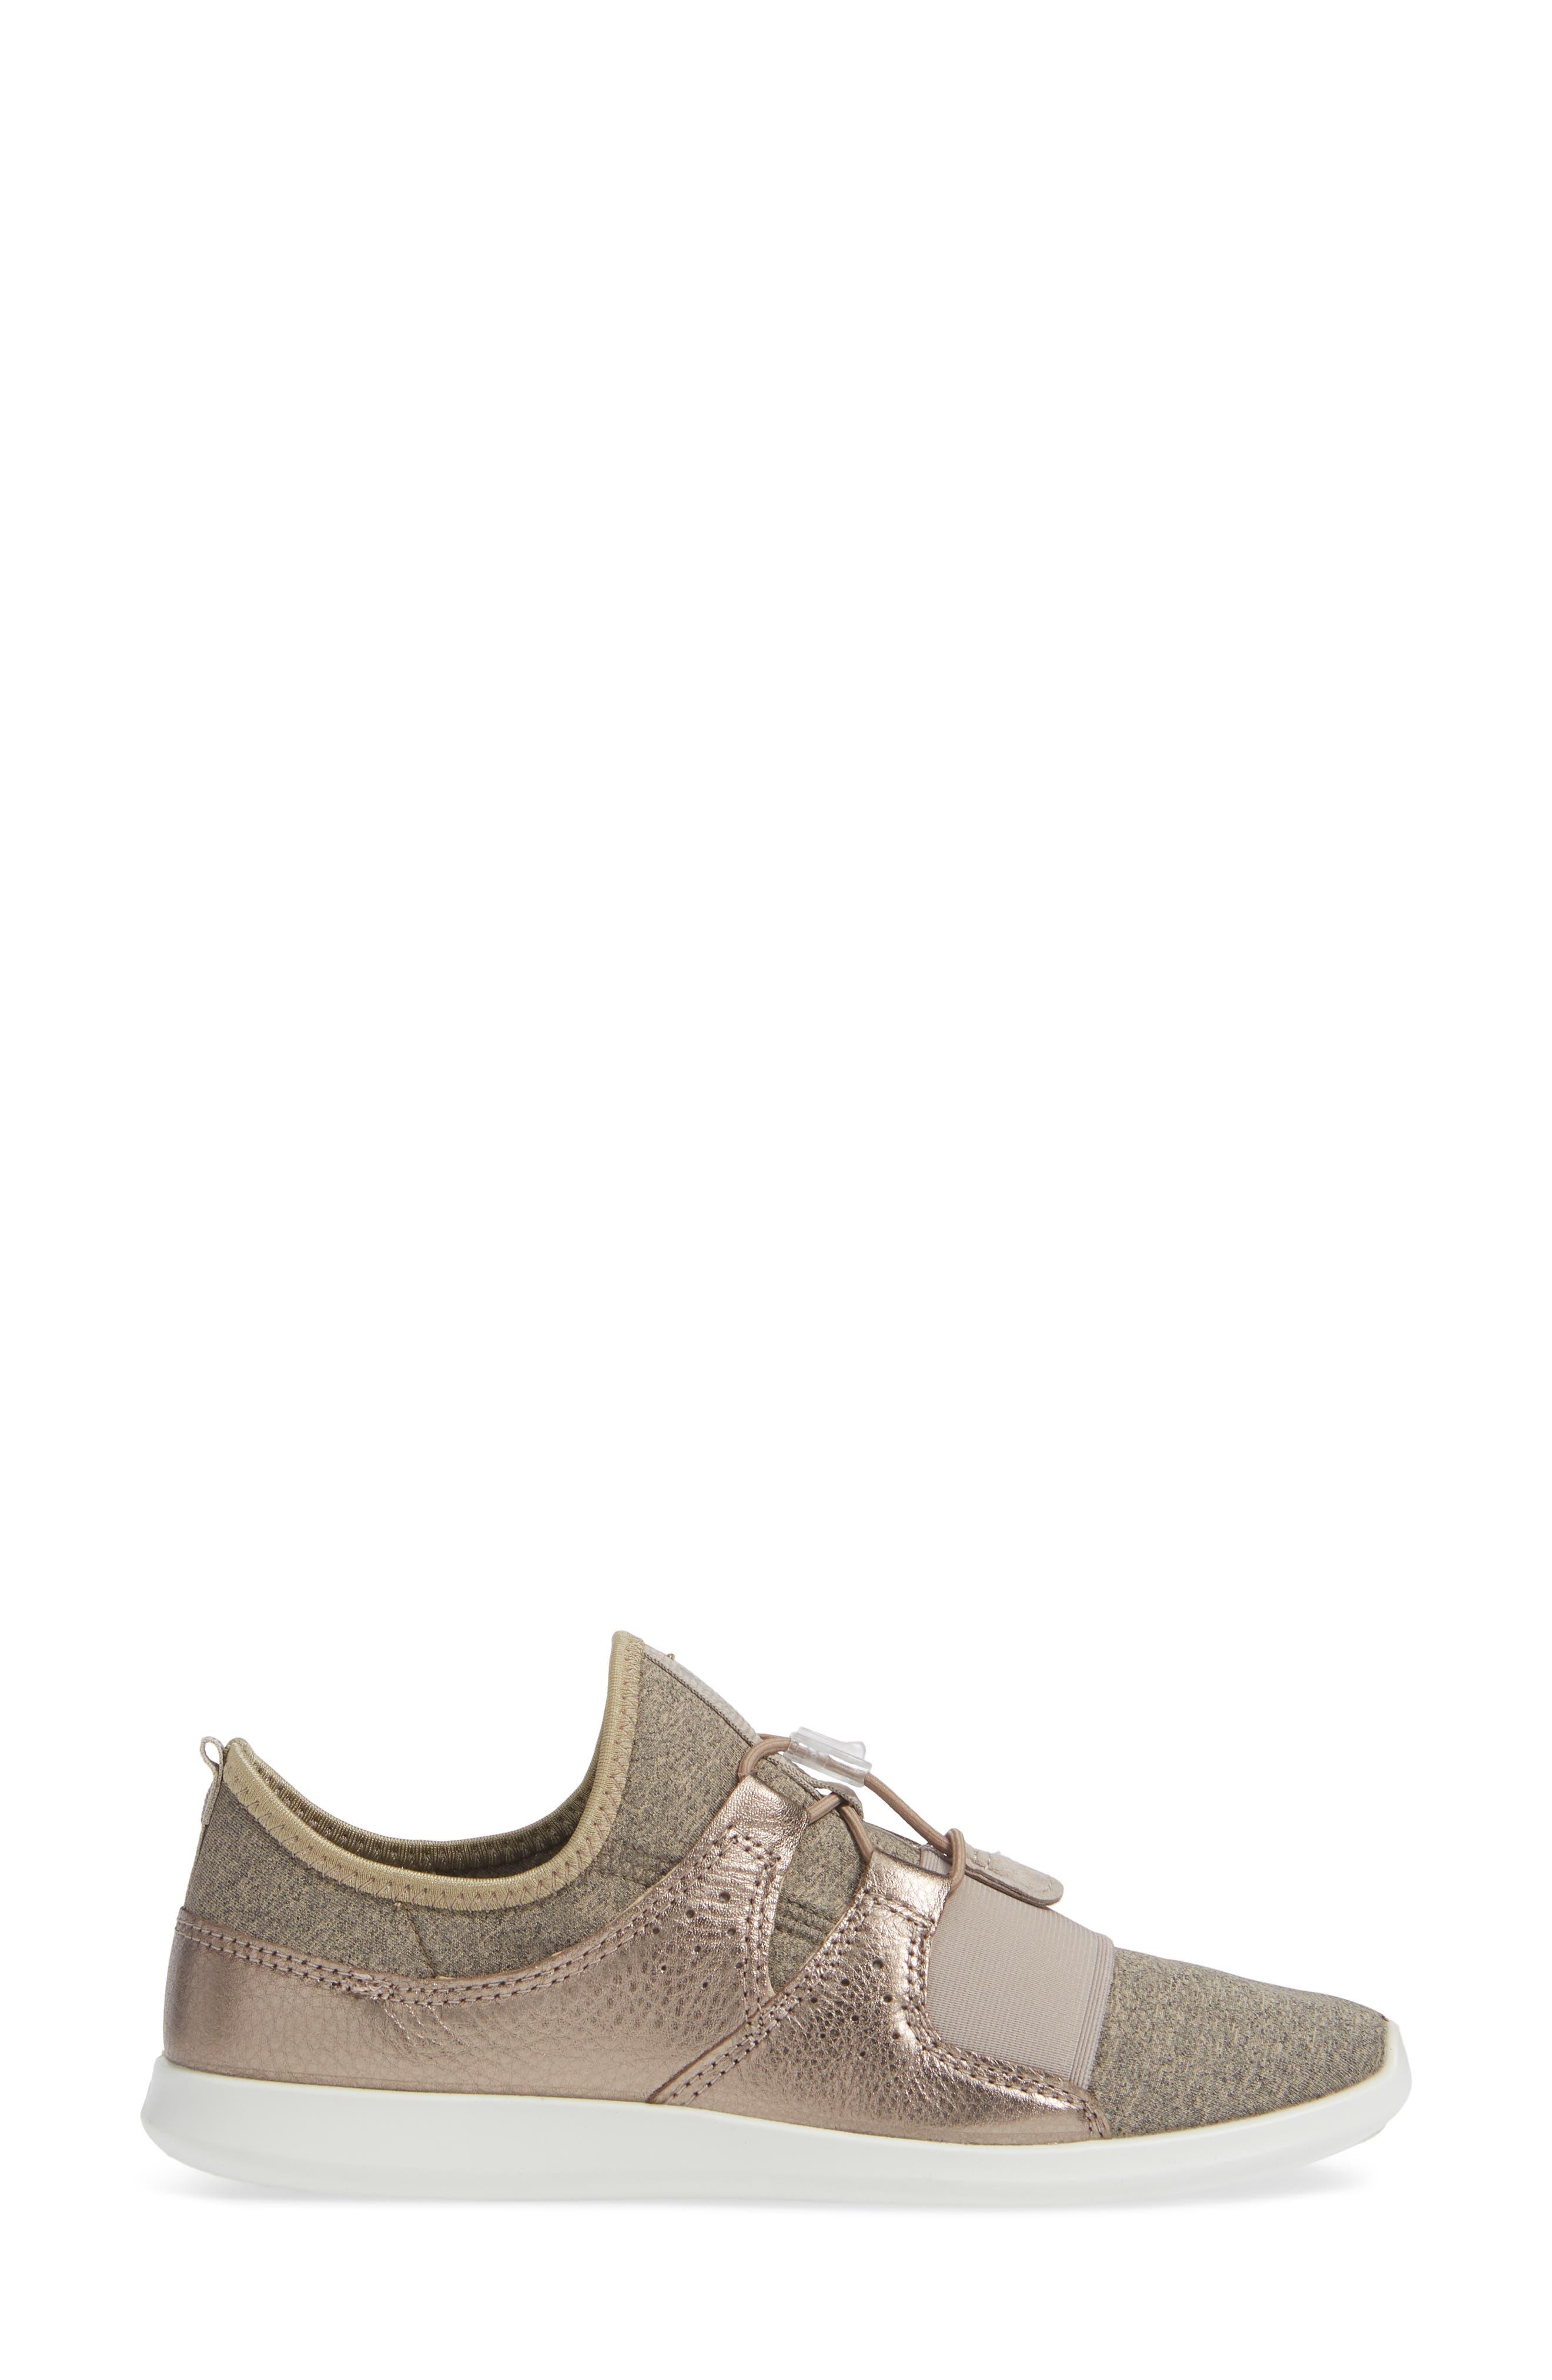 ECCO,                             Sense Toggle Sneaker,                             Alternate thumbnail 3, color,                             METALLIC STONE LEATHER